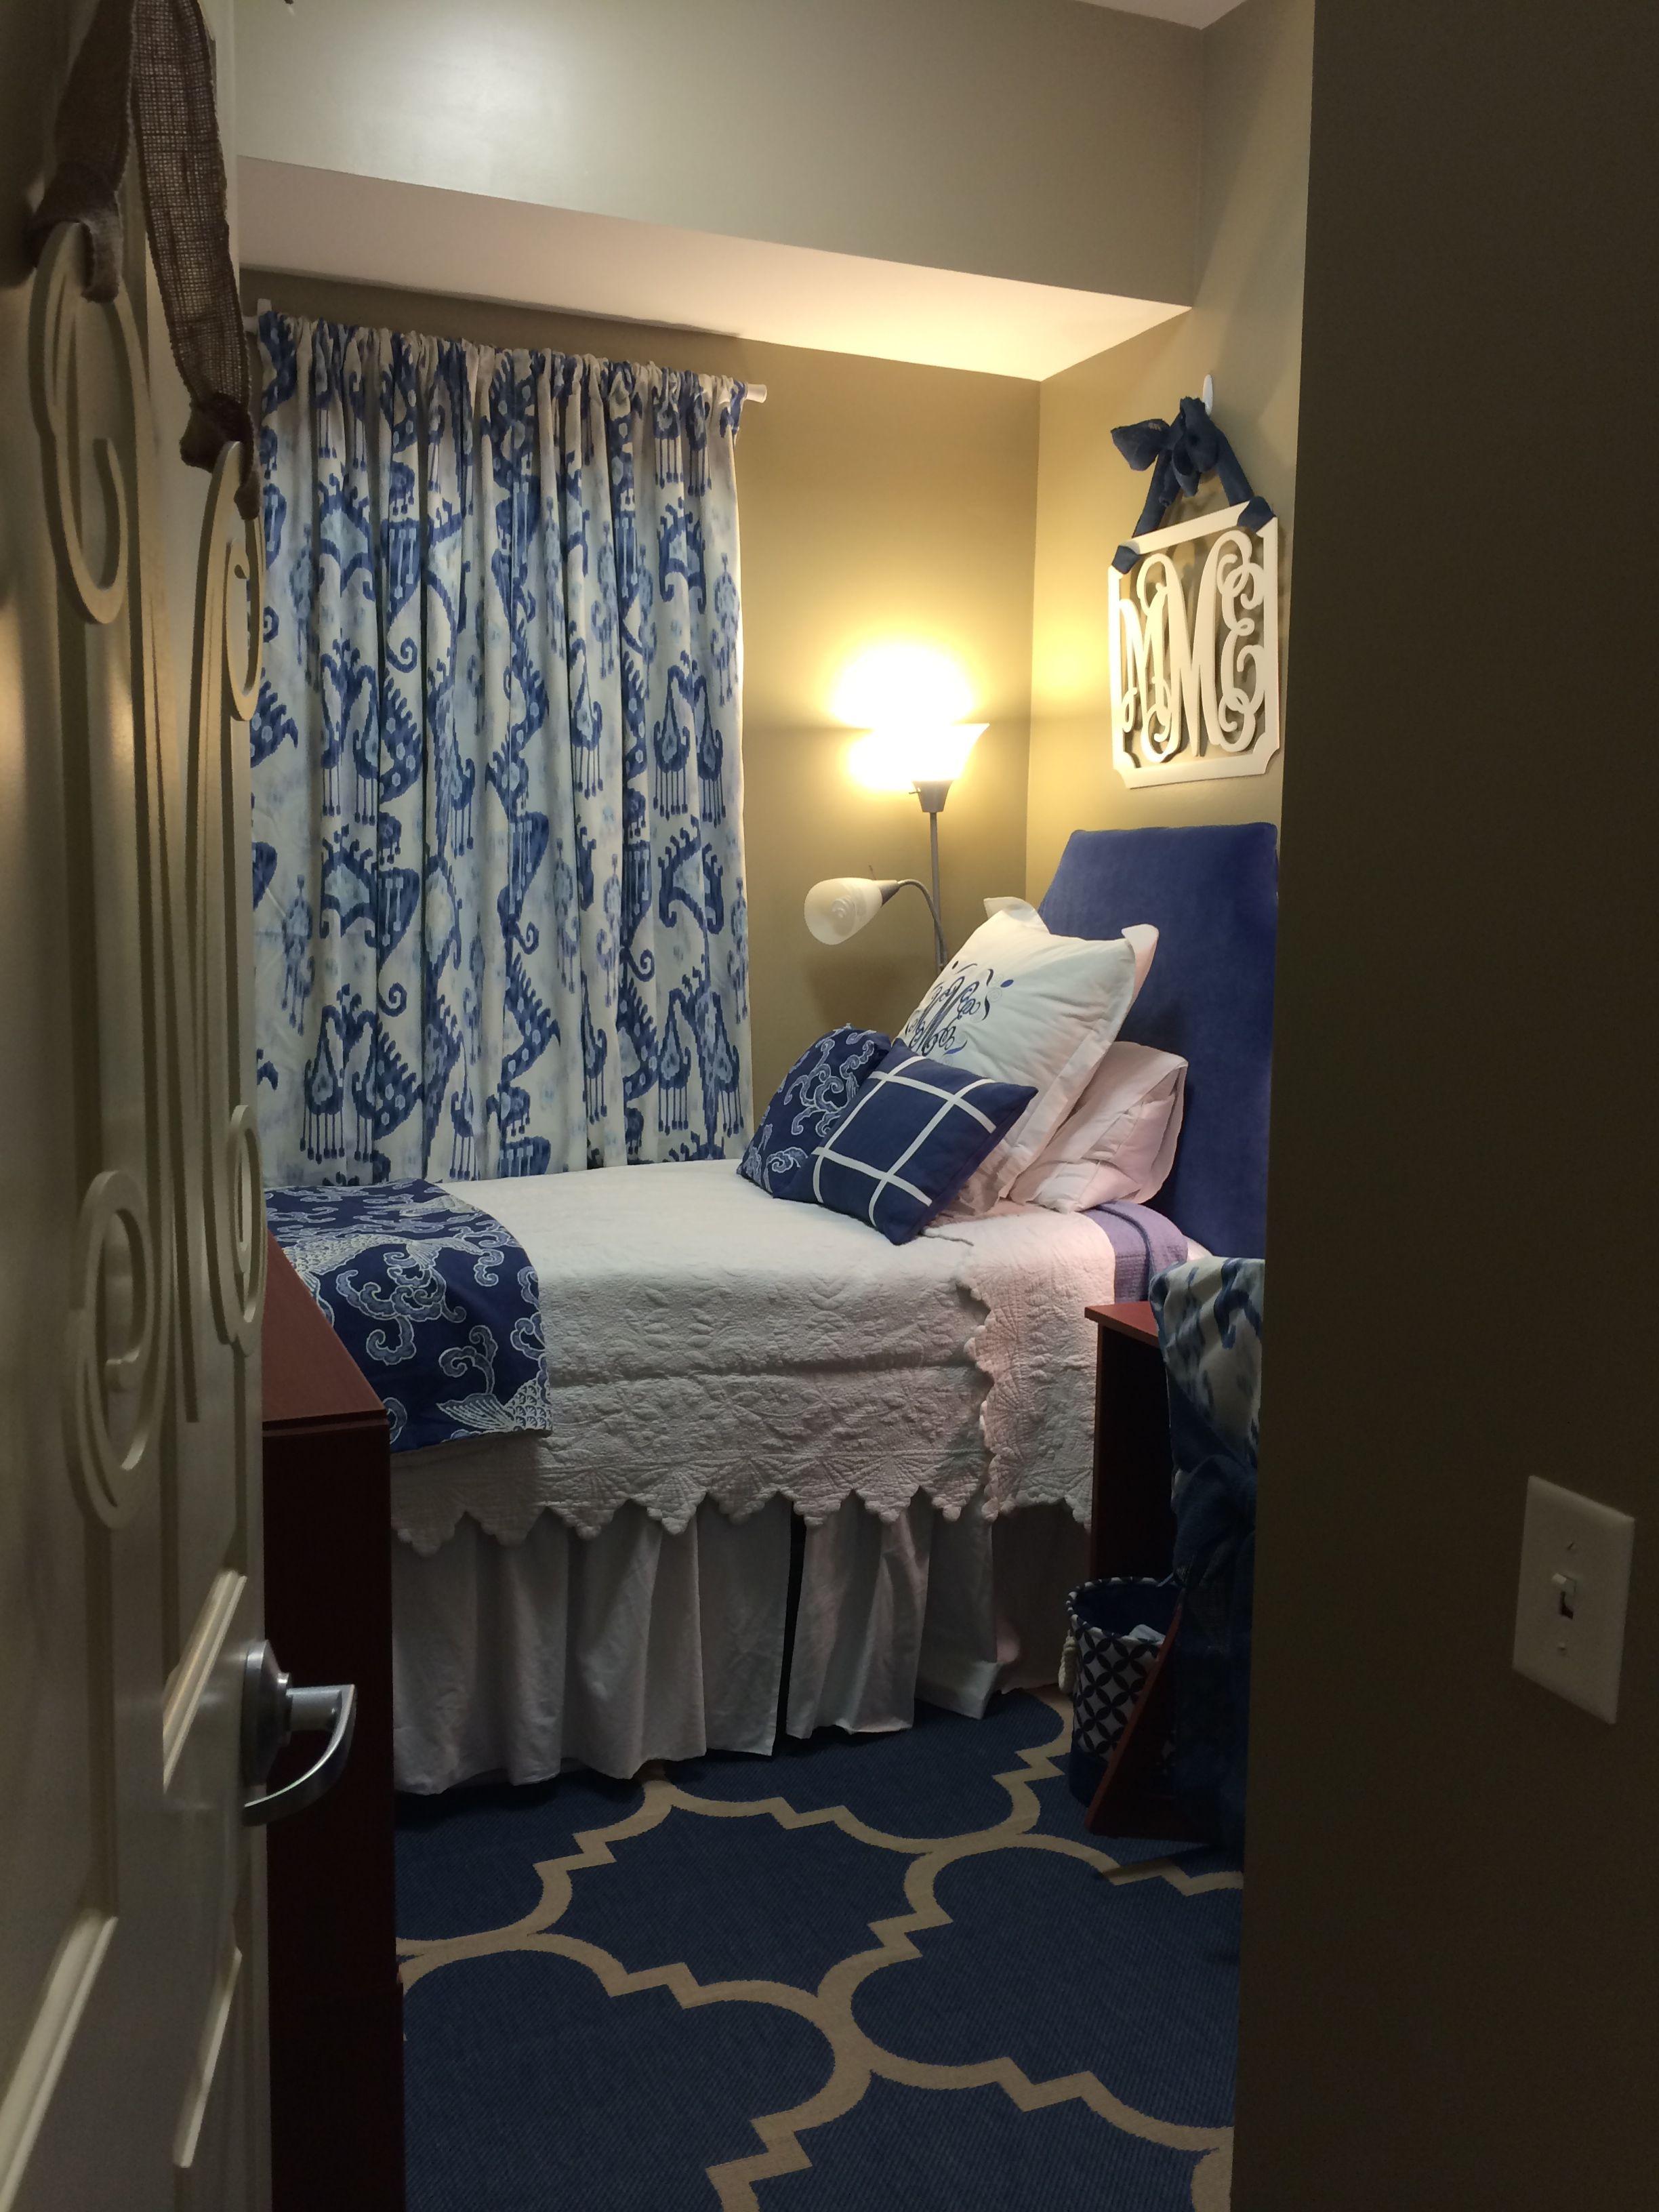 Village dorm at Auburn University Village dorm